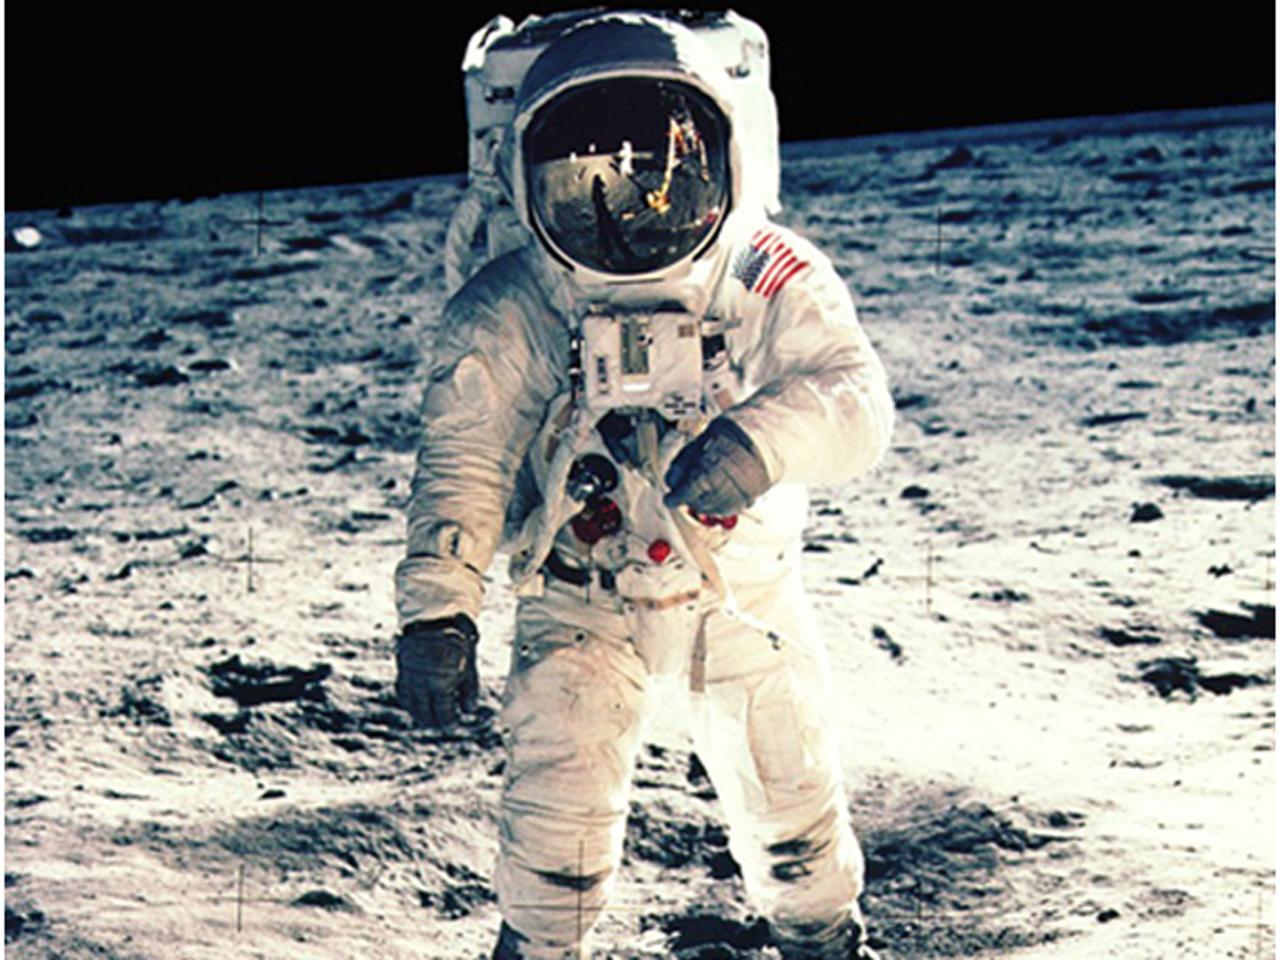 apollo 11 space mission on tv - photo #5